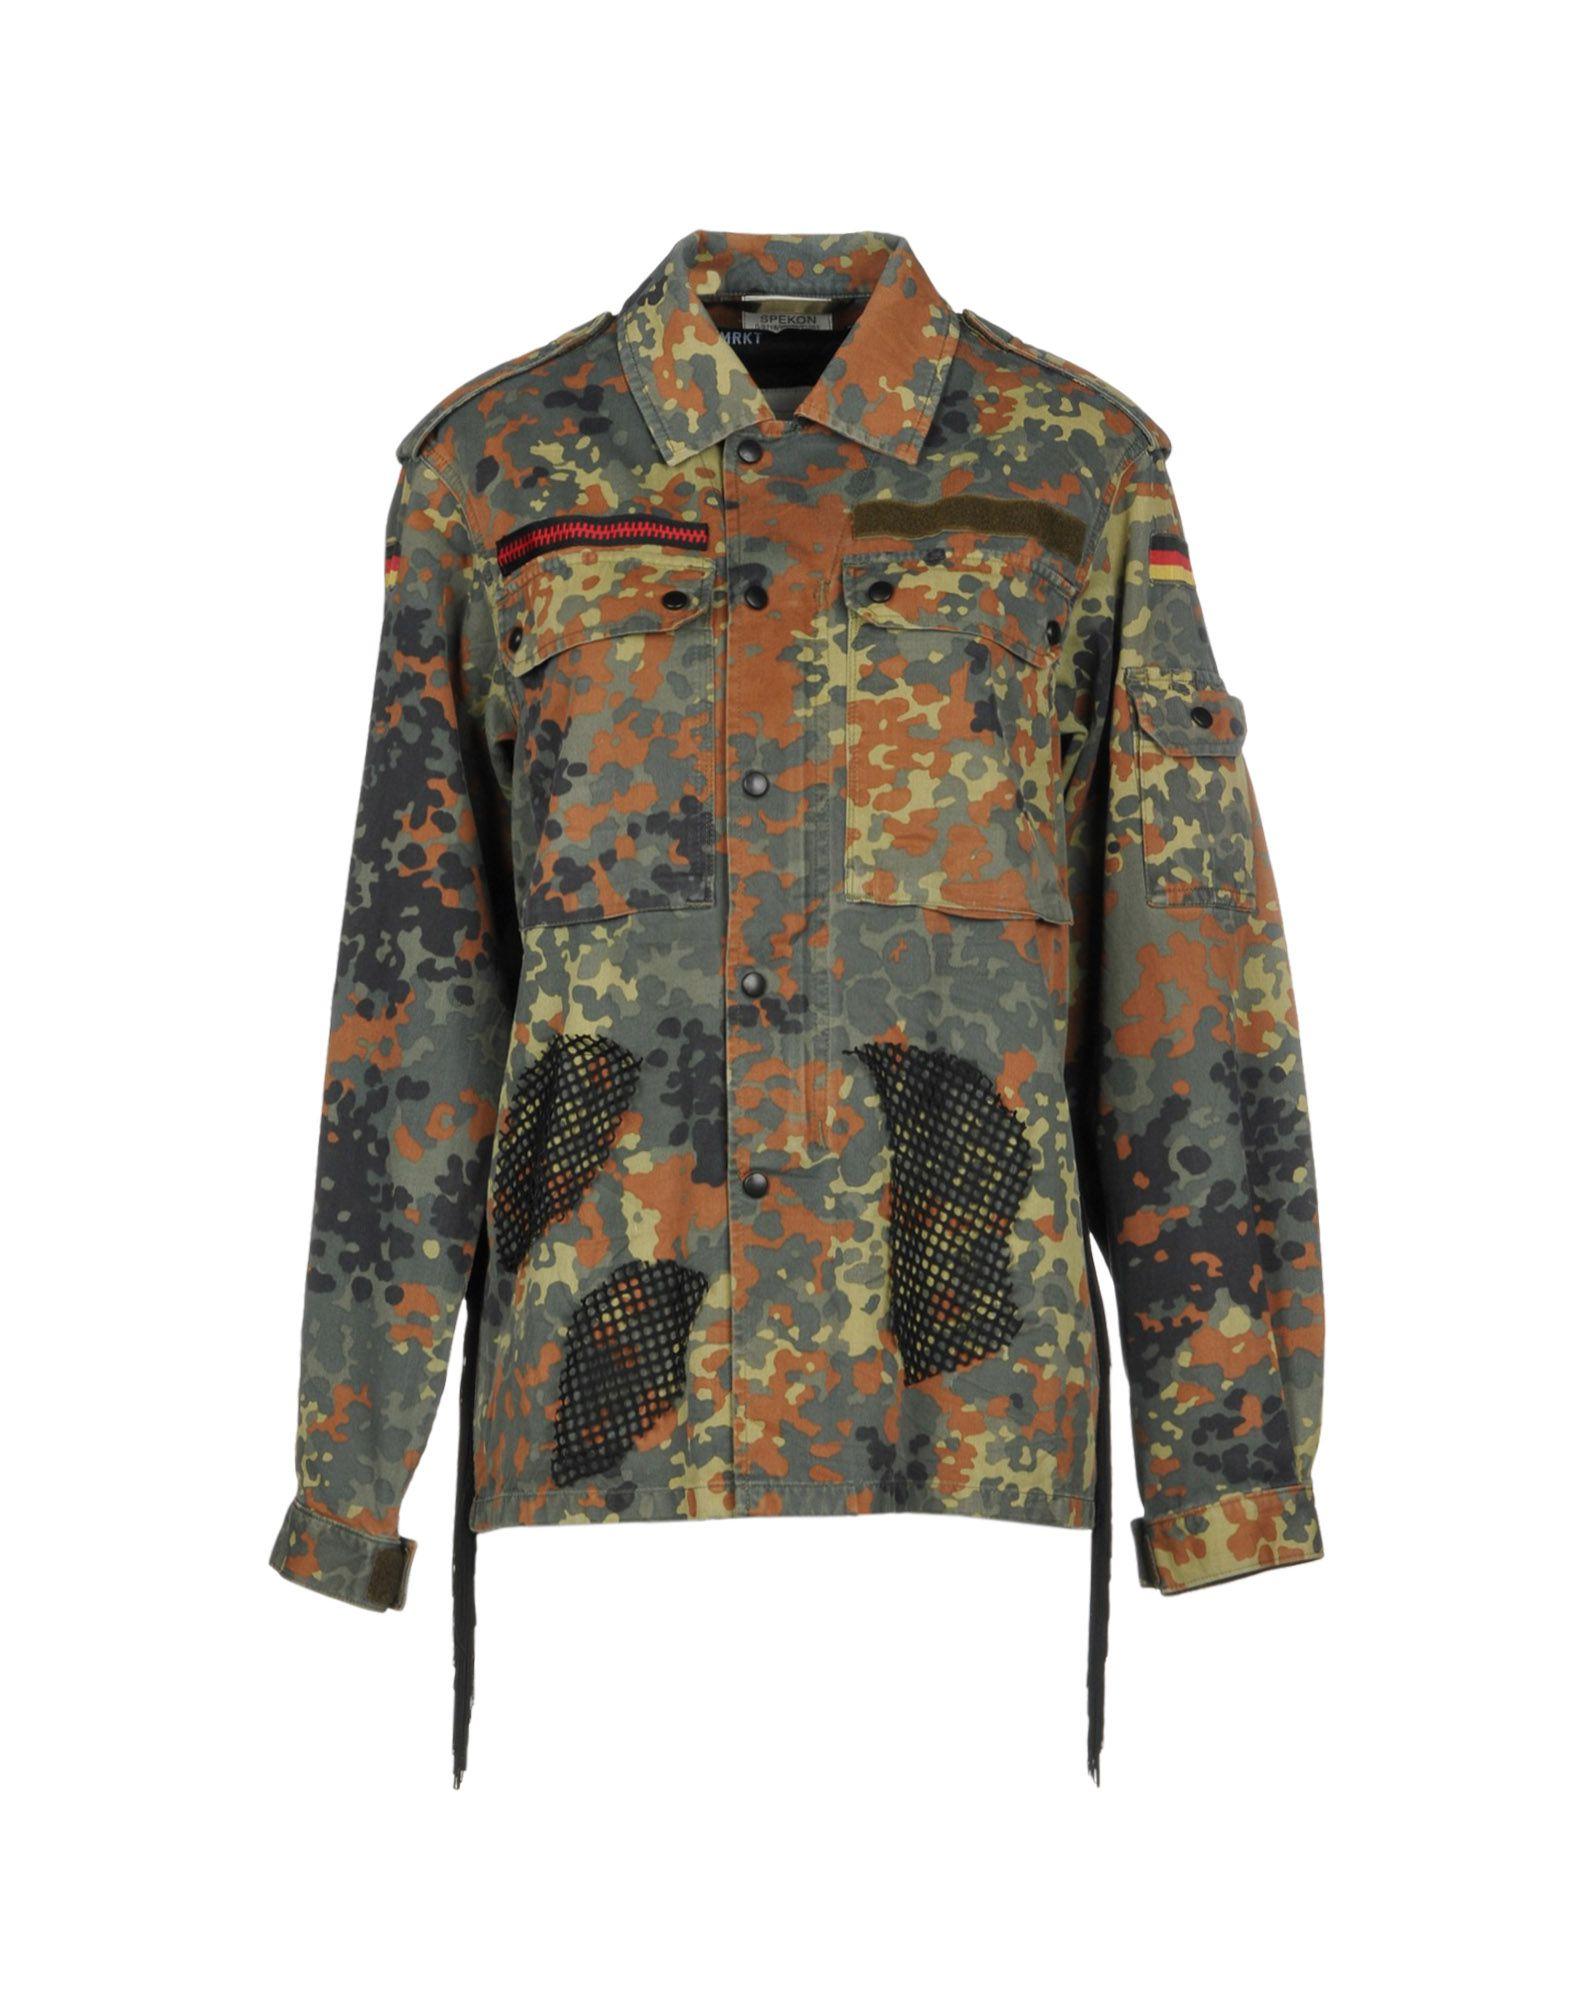 MINIMARKET Jacket in Military Green